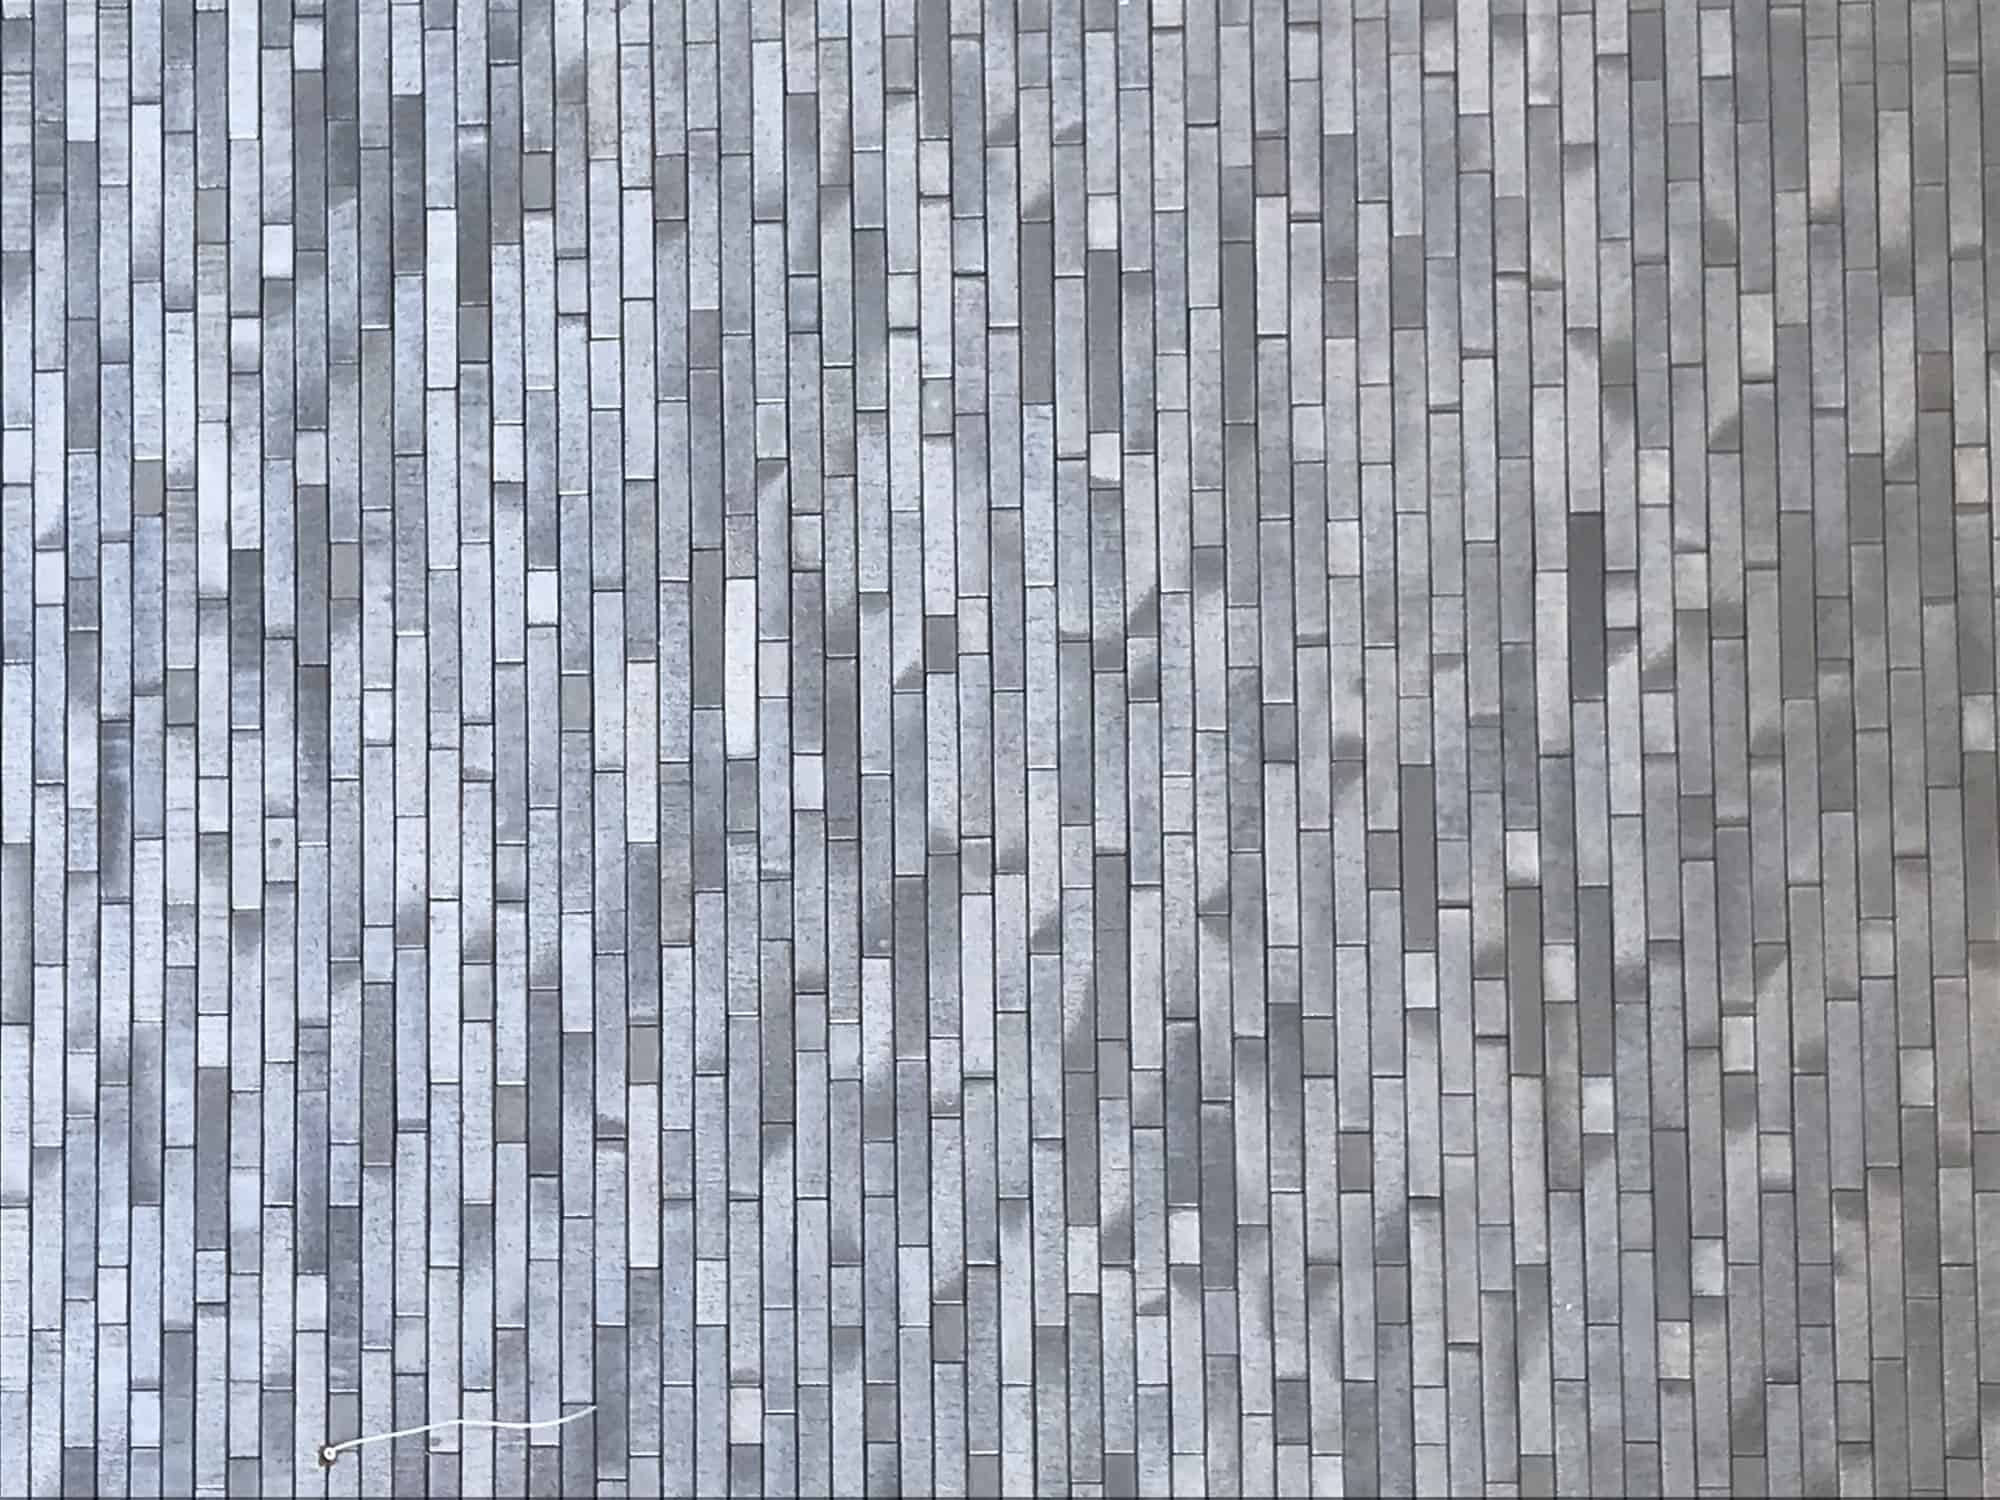 Detail afbeelding 6 van VM   –    Strakke Gezinswoning    –   Maasmechelen | Ontwerp door architect Patrick Strackx